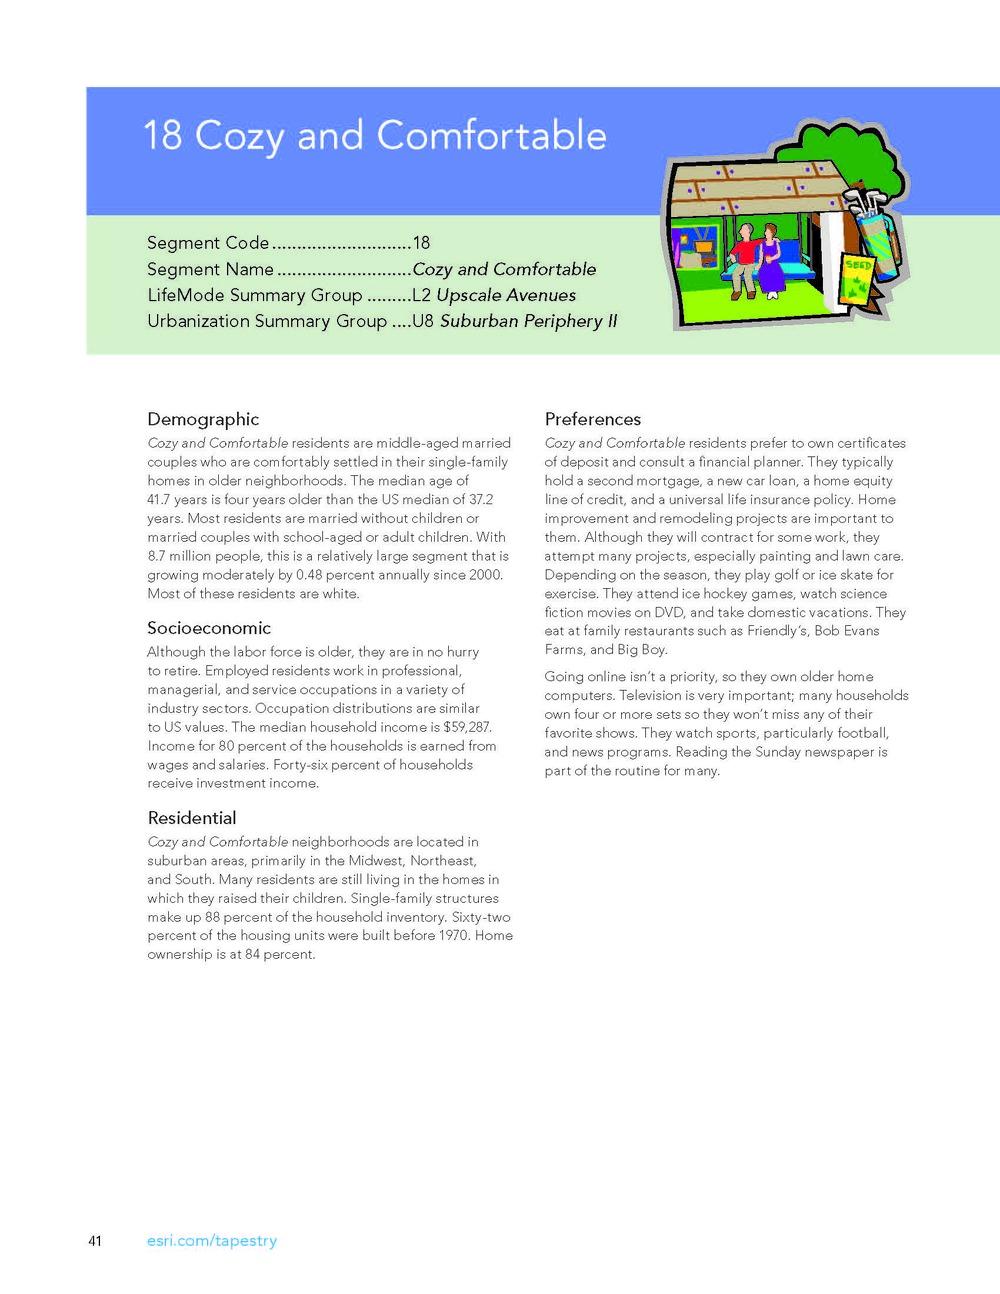 tapestry-segmentation_Page_44.jpg